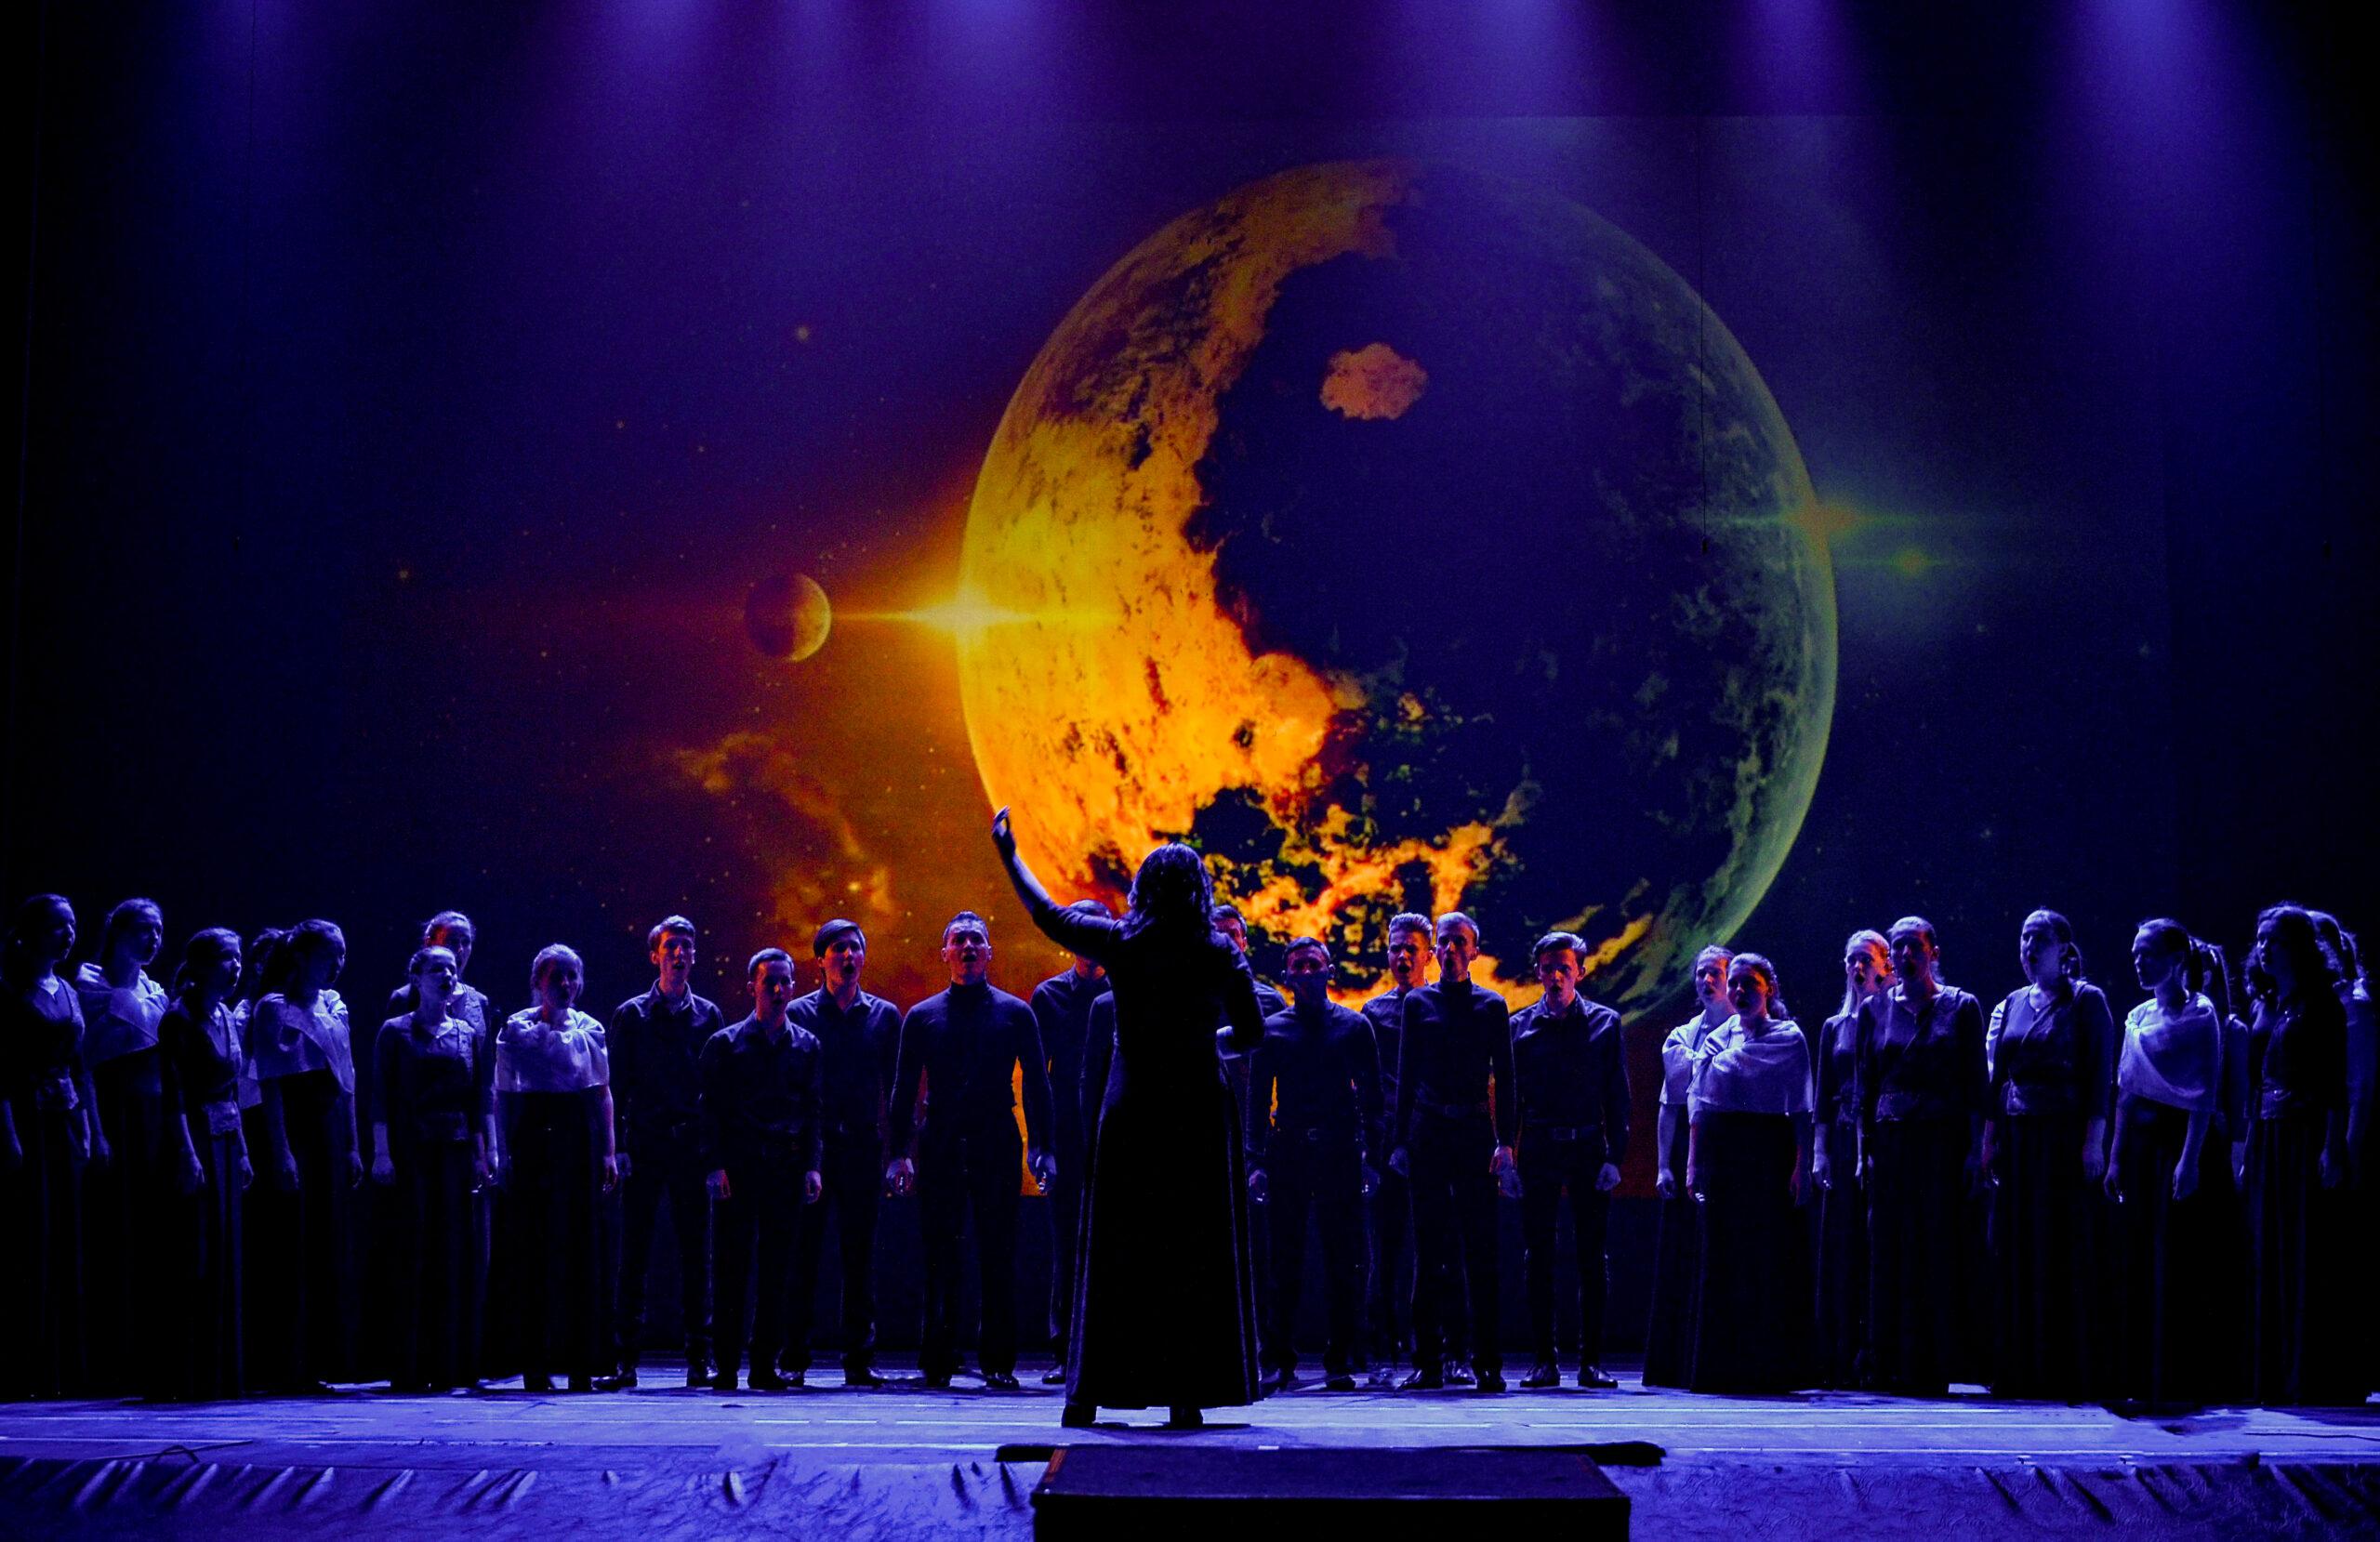 Vladimir Sidorkin, Rusija/Russia: In the Music Space, 2019, Chamber choir »Cantilena«, ZDA